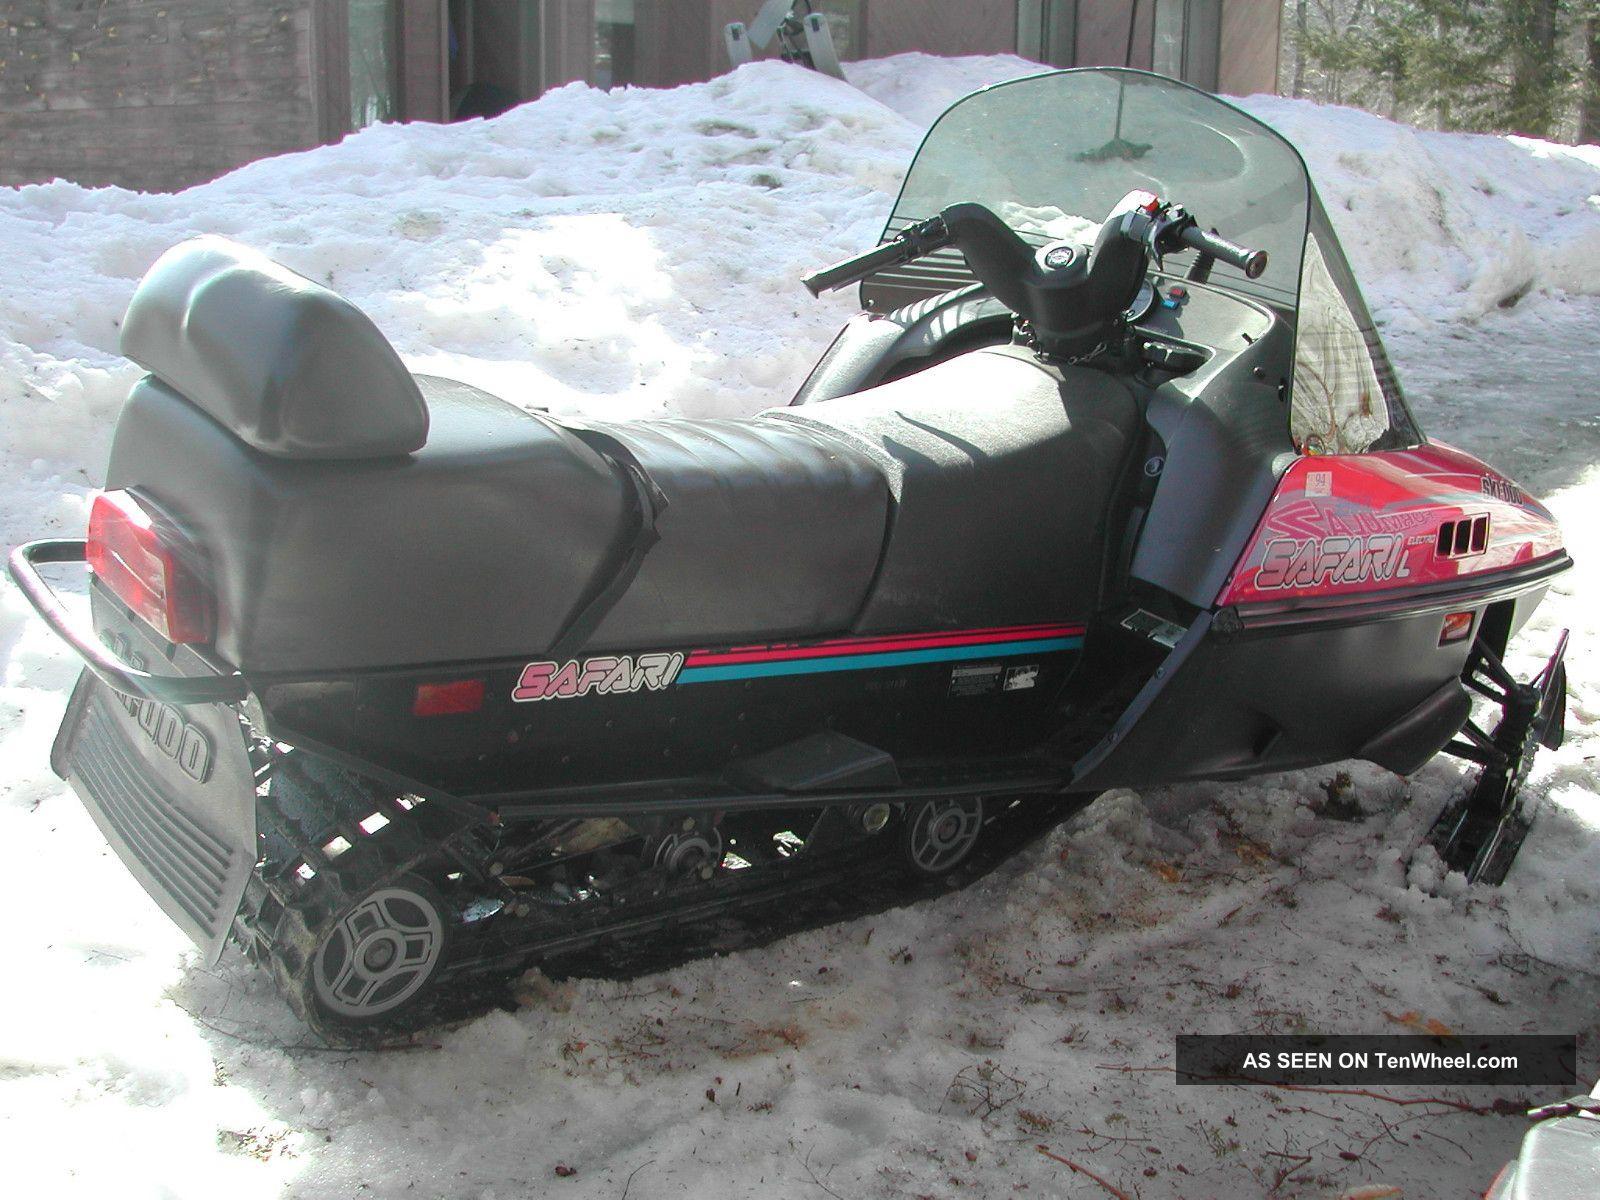 1994 ski doo 1994 formula z 1991 safari le rh tenwheel com Ski-Doo Safari 377 Parts 1994 Ski-Doo Safari Deluxe